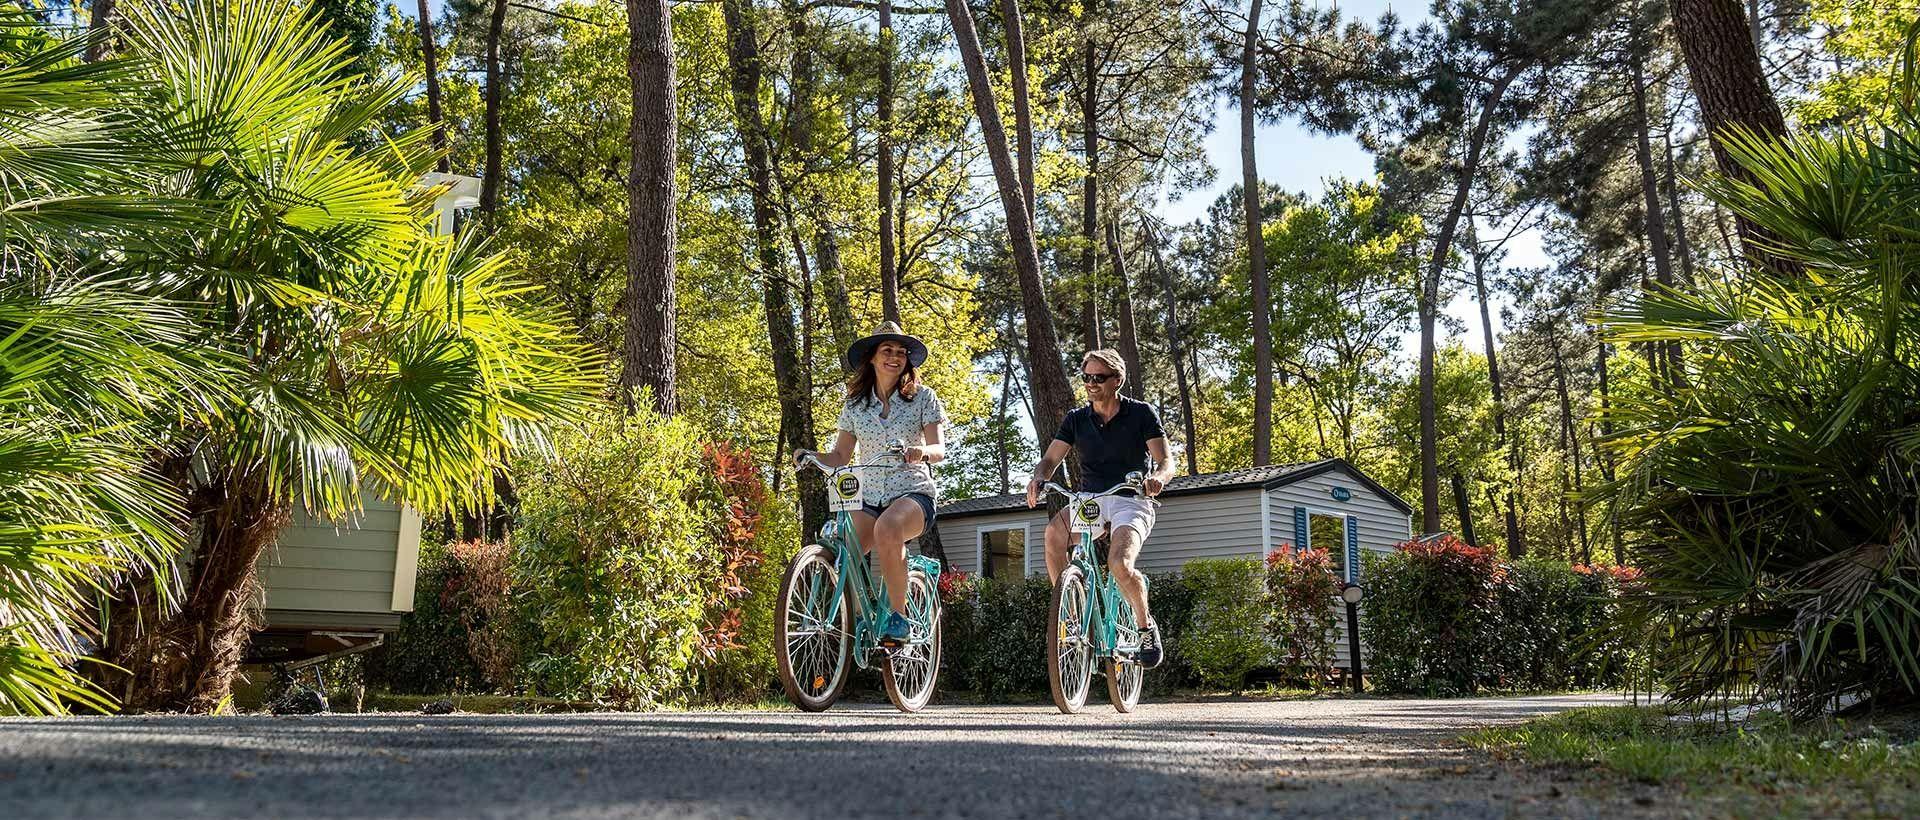 Camping en bicicleta